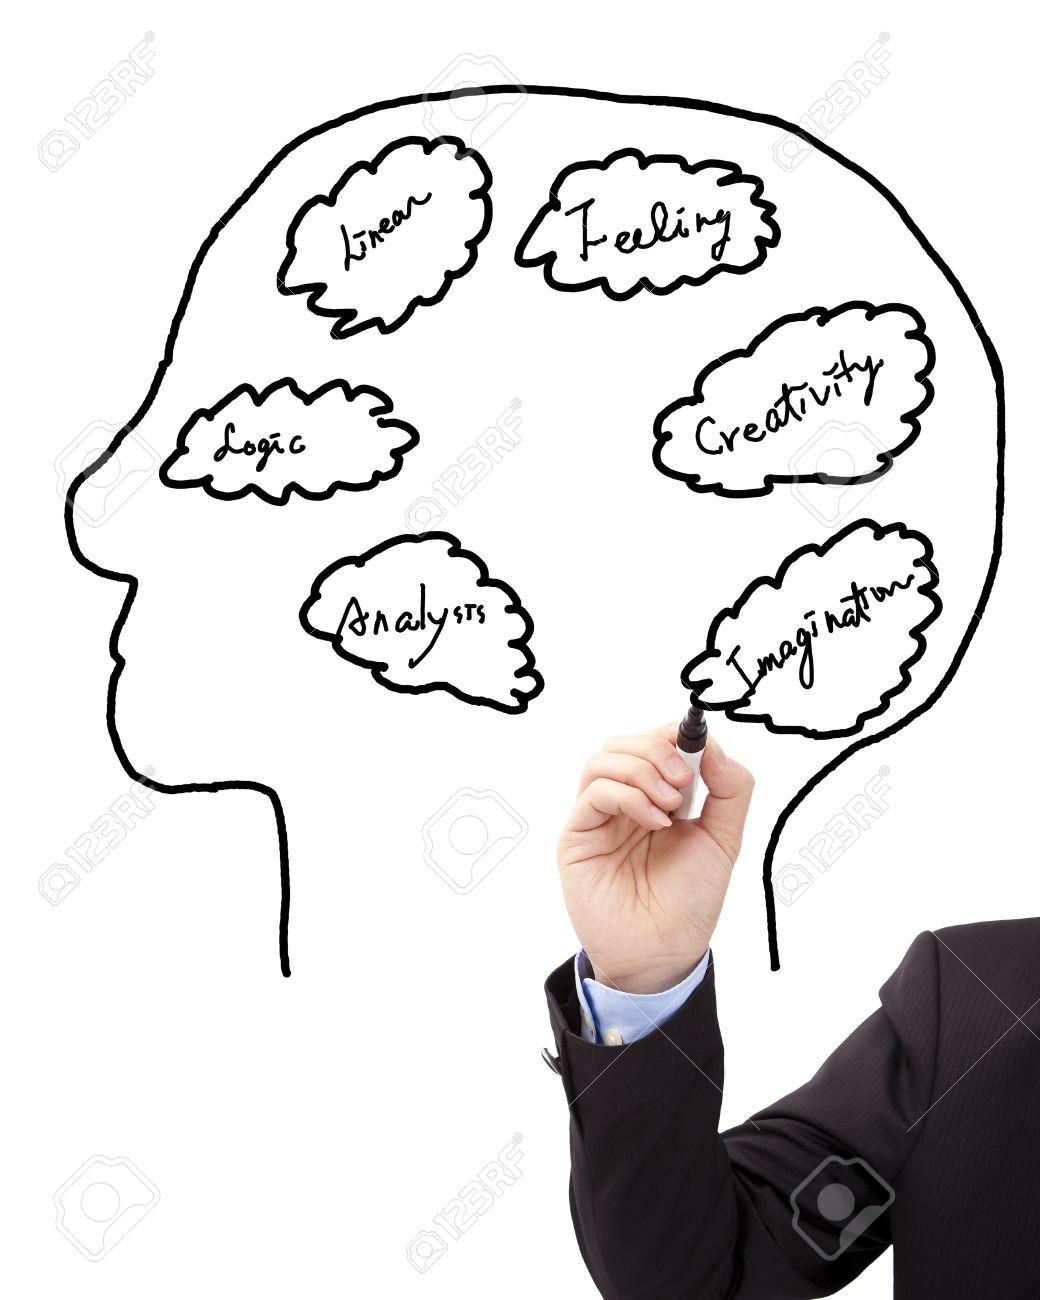 Businessmans hand draw brain concept diagram stock photo picture businessmans hand draw brain concept diagram stock photo 9594297 ccuart Image collections